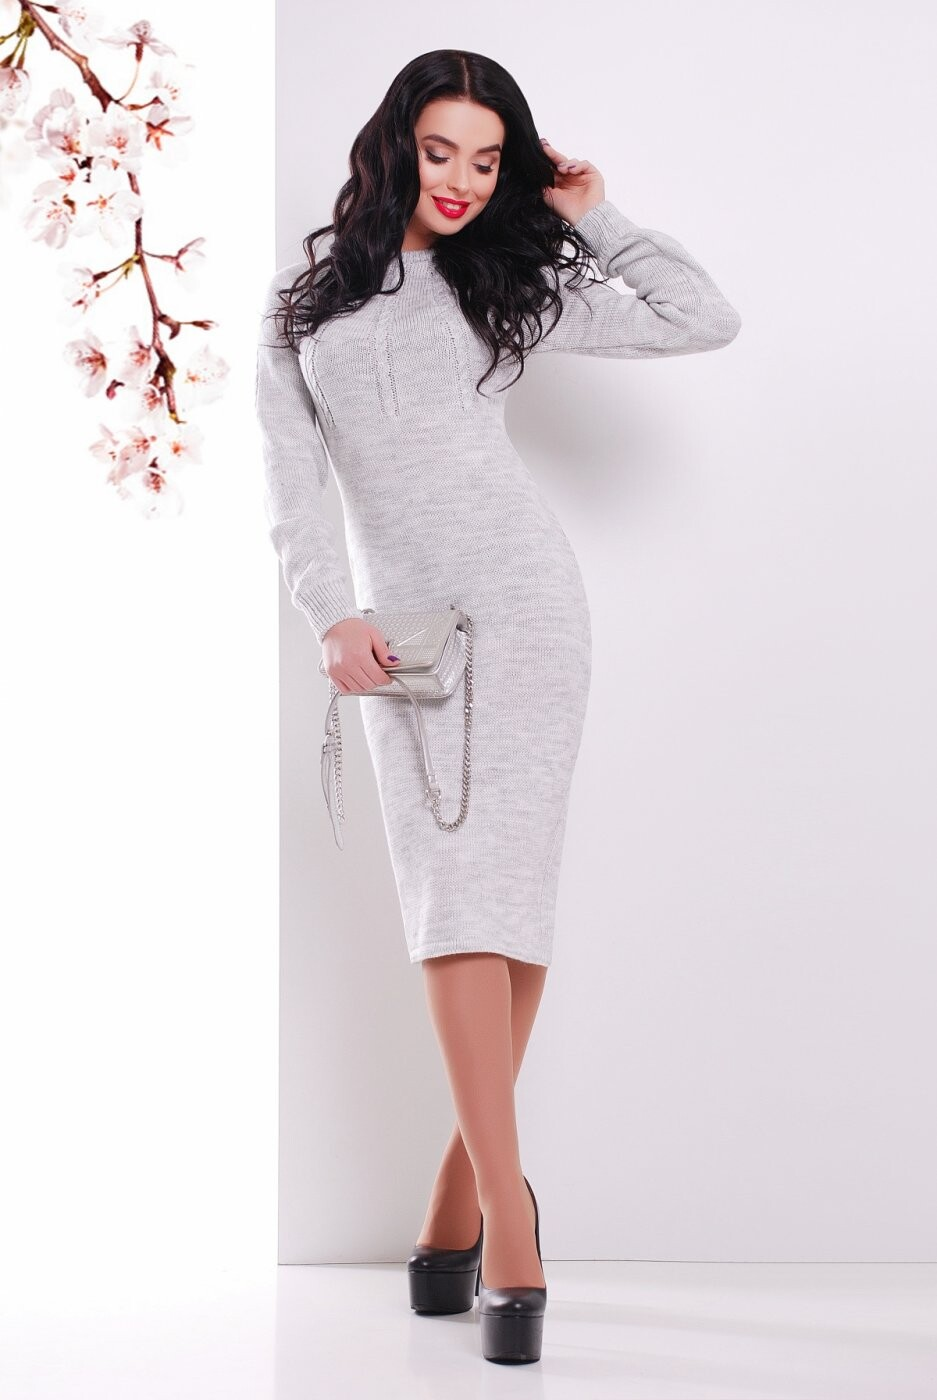 Вязаное Платье 137 светло-серый от MarSe, цвет светло-серый